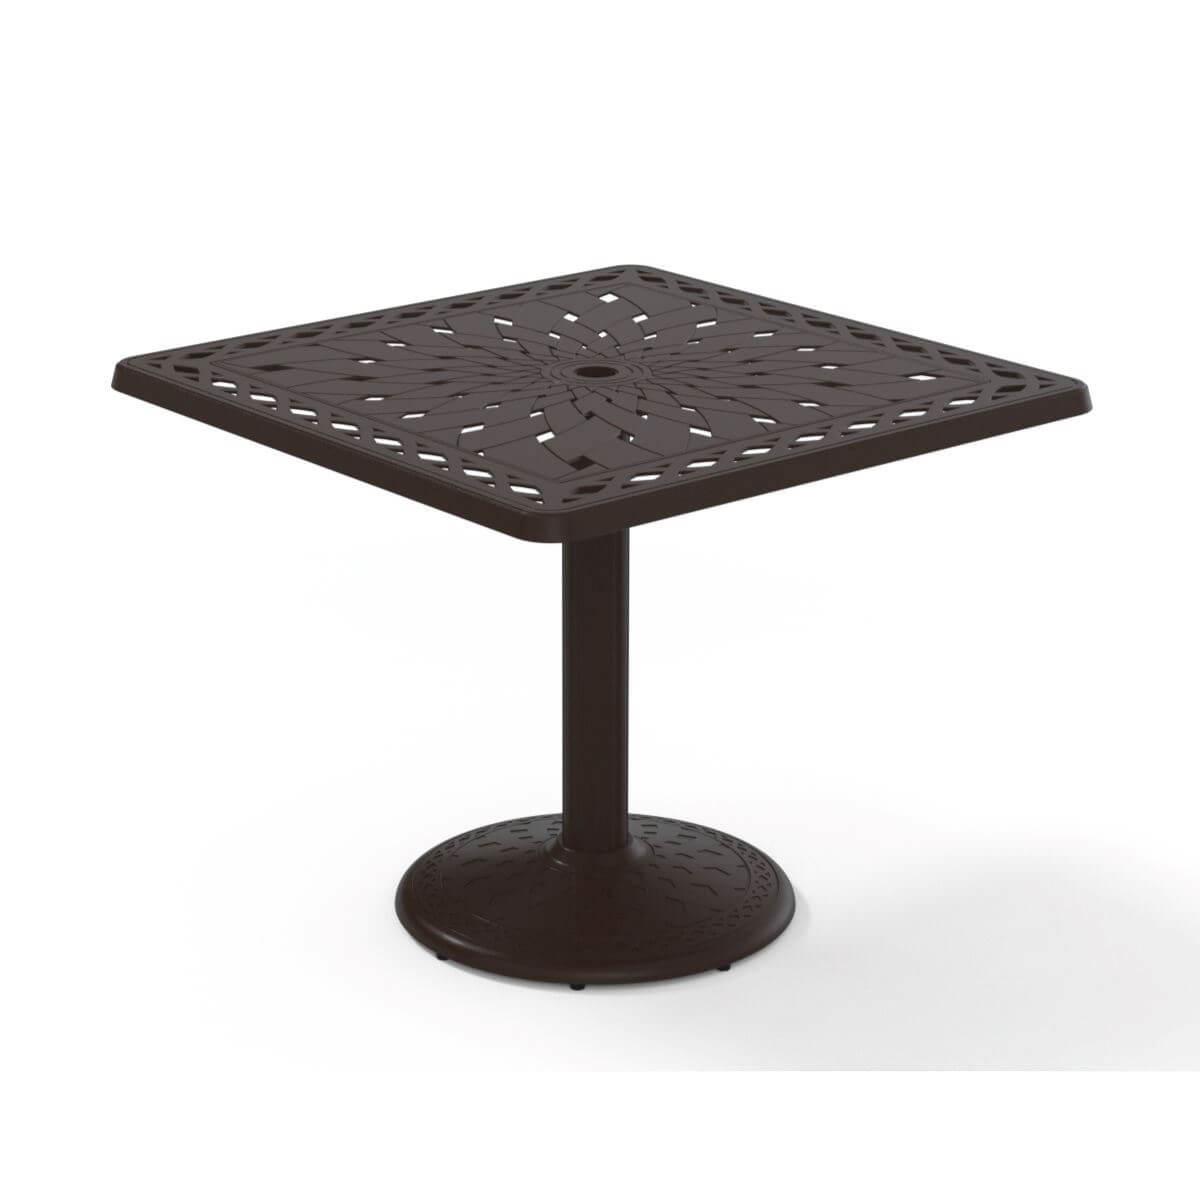 Pleasant Telescope Square Dining Table 36 Inch Cast Aluminum With Pedestal Base Interior Design Ideas Gresisoteloinfo